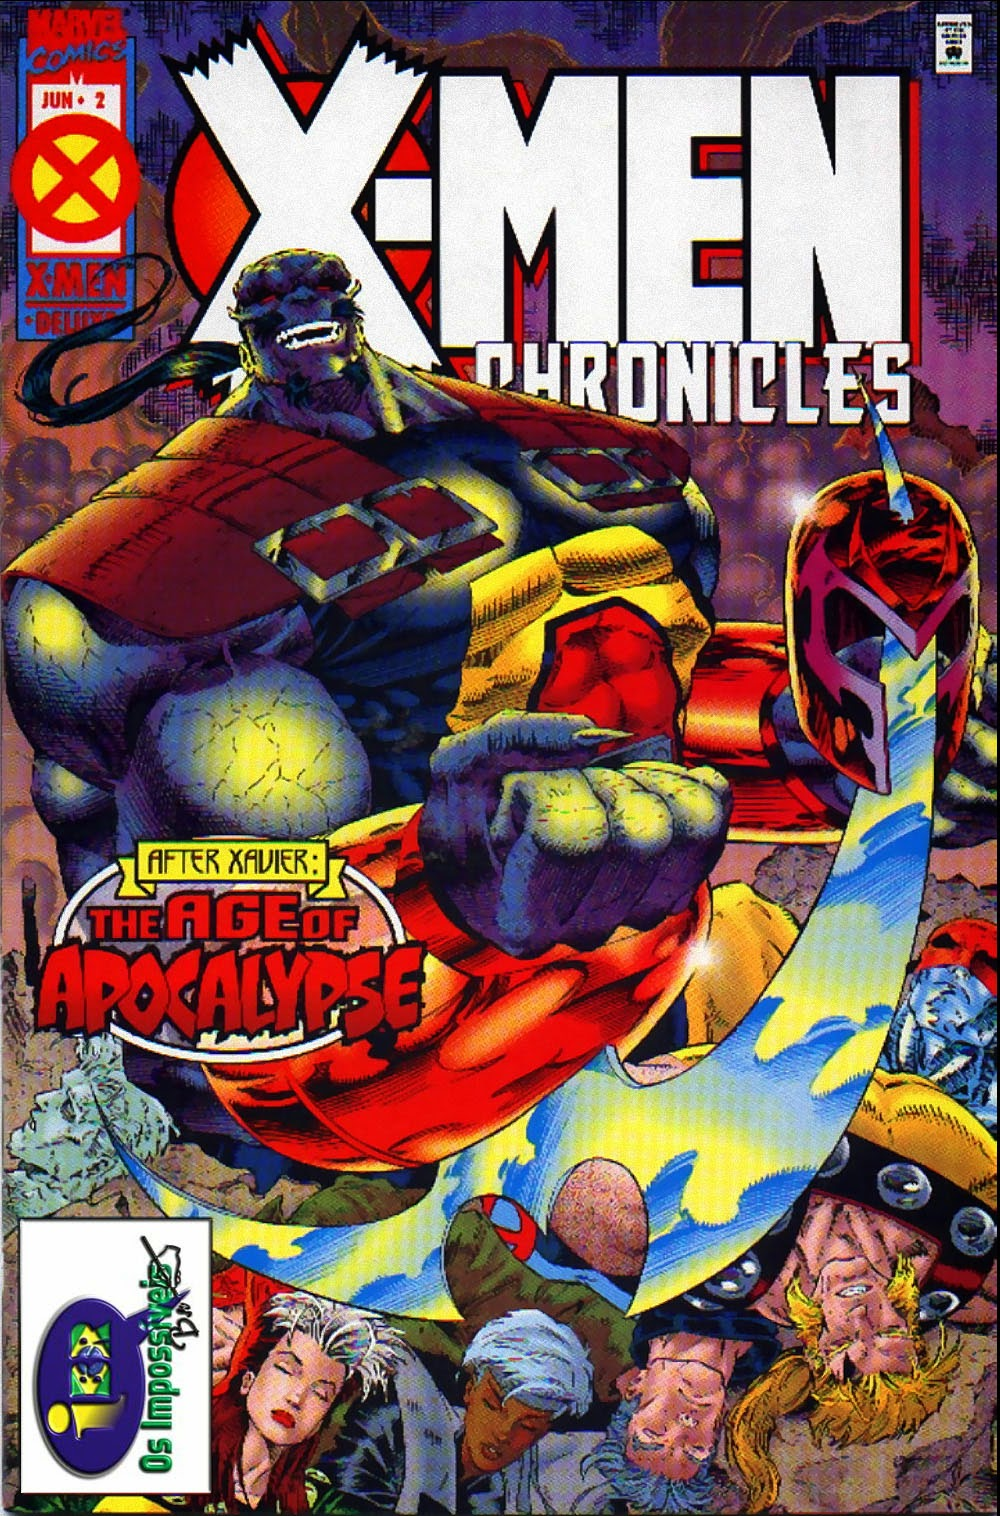 X-Men - A Era do Apocalipse #2